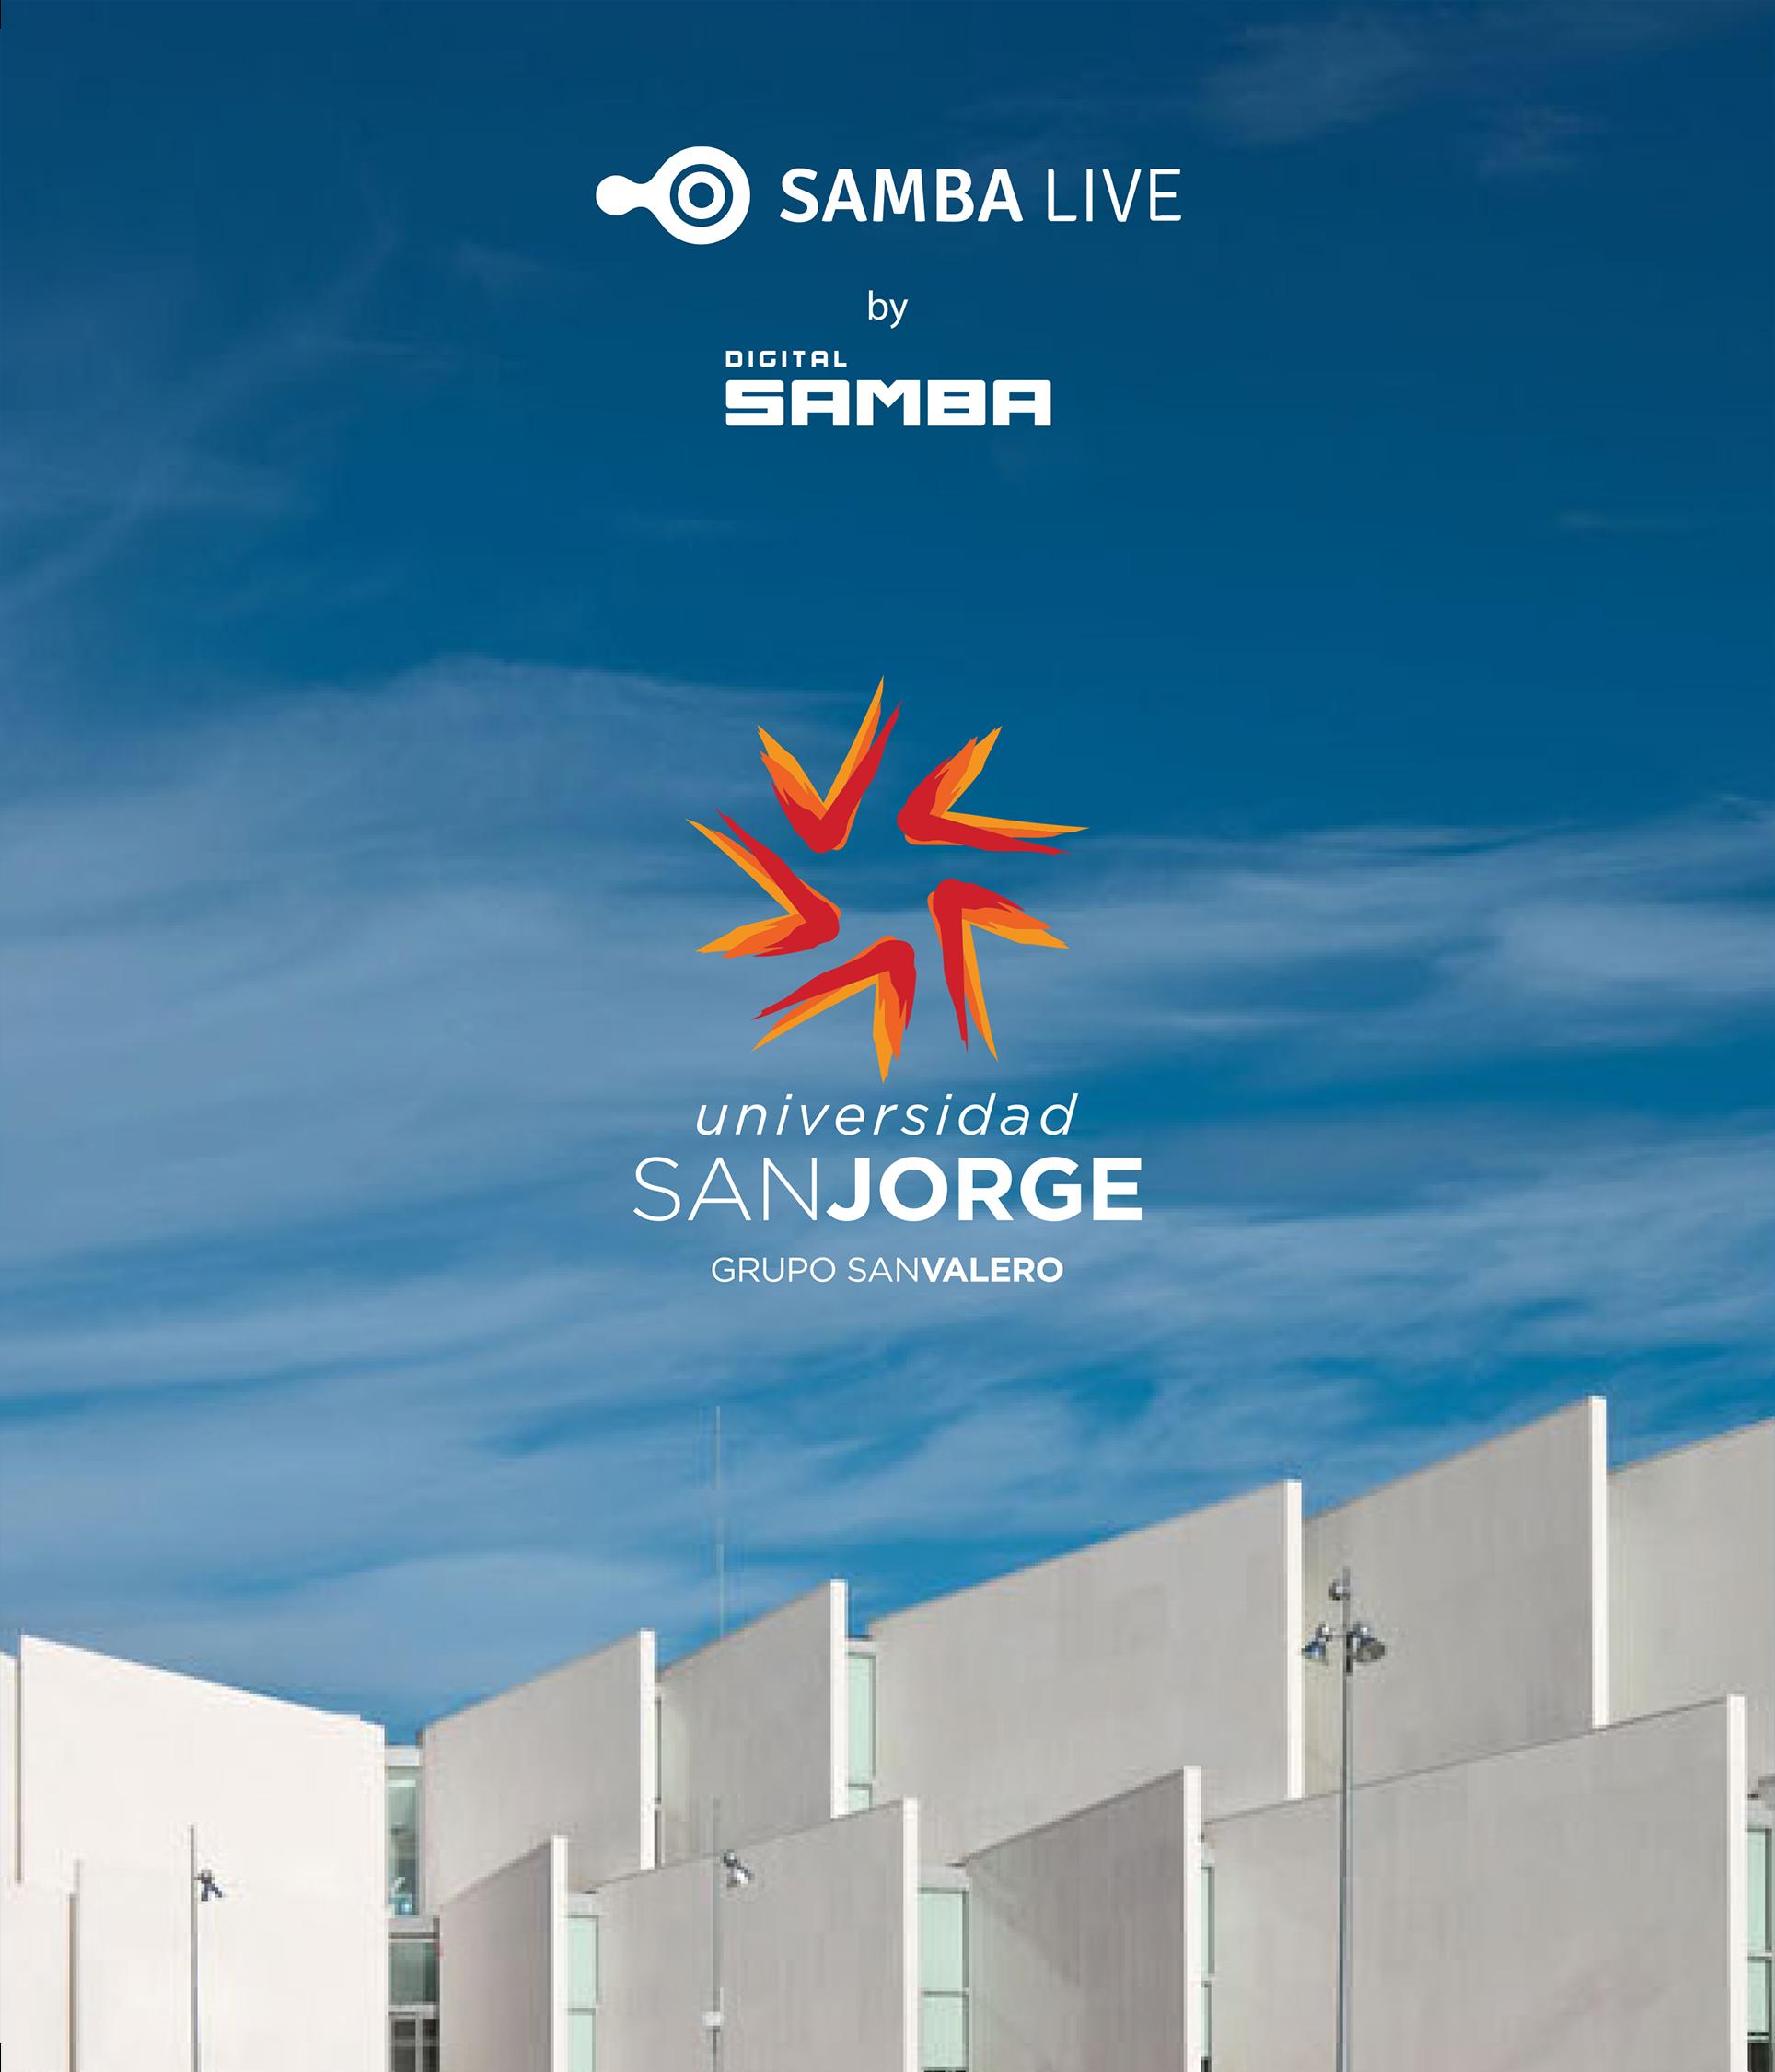 University of San Jorge case study